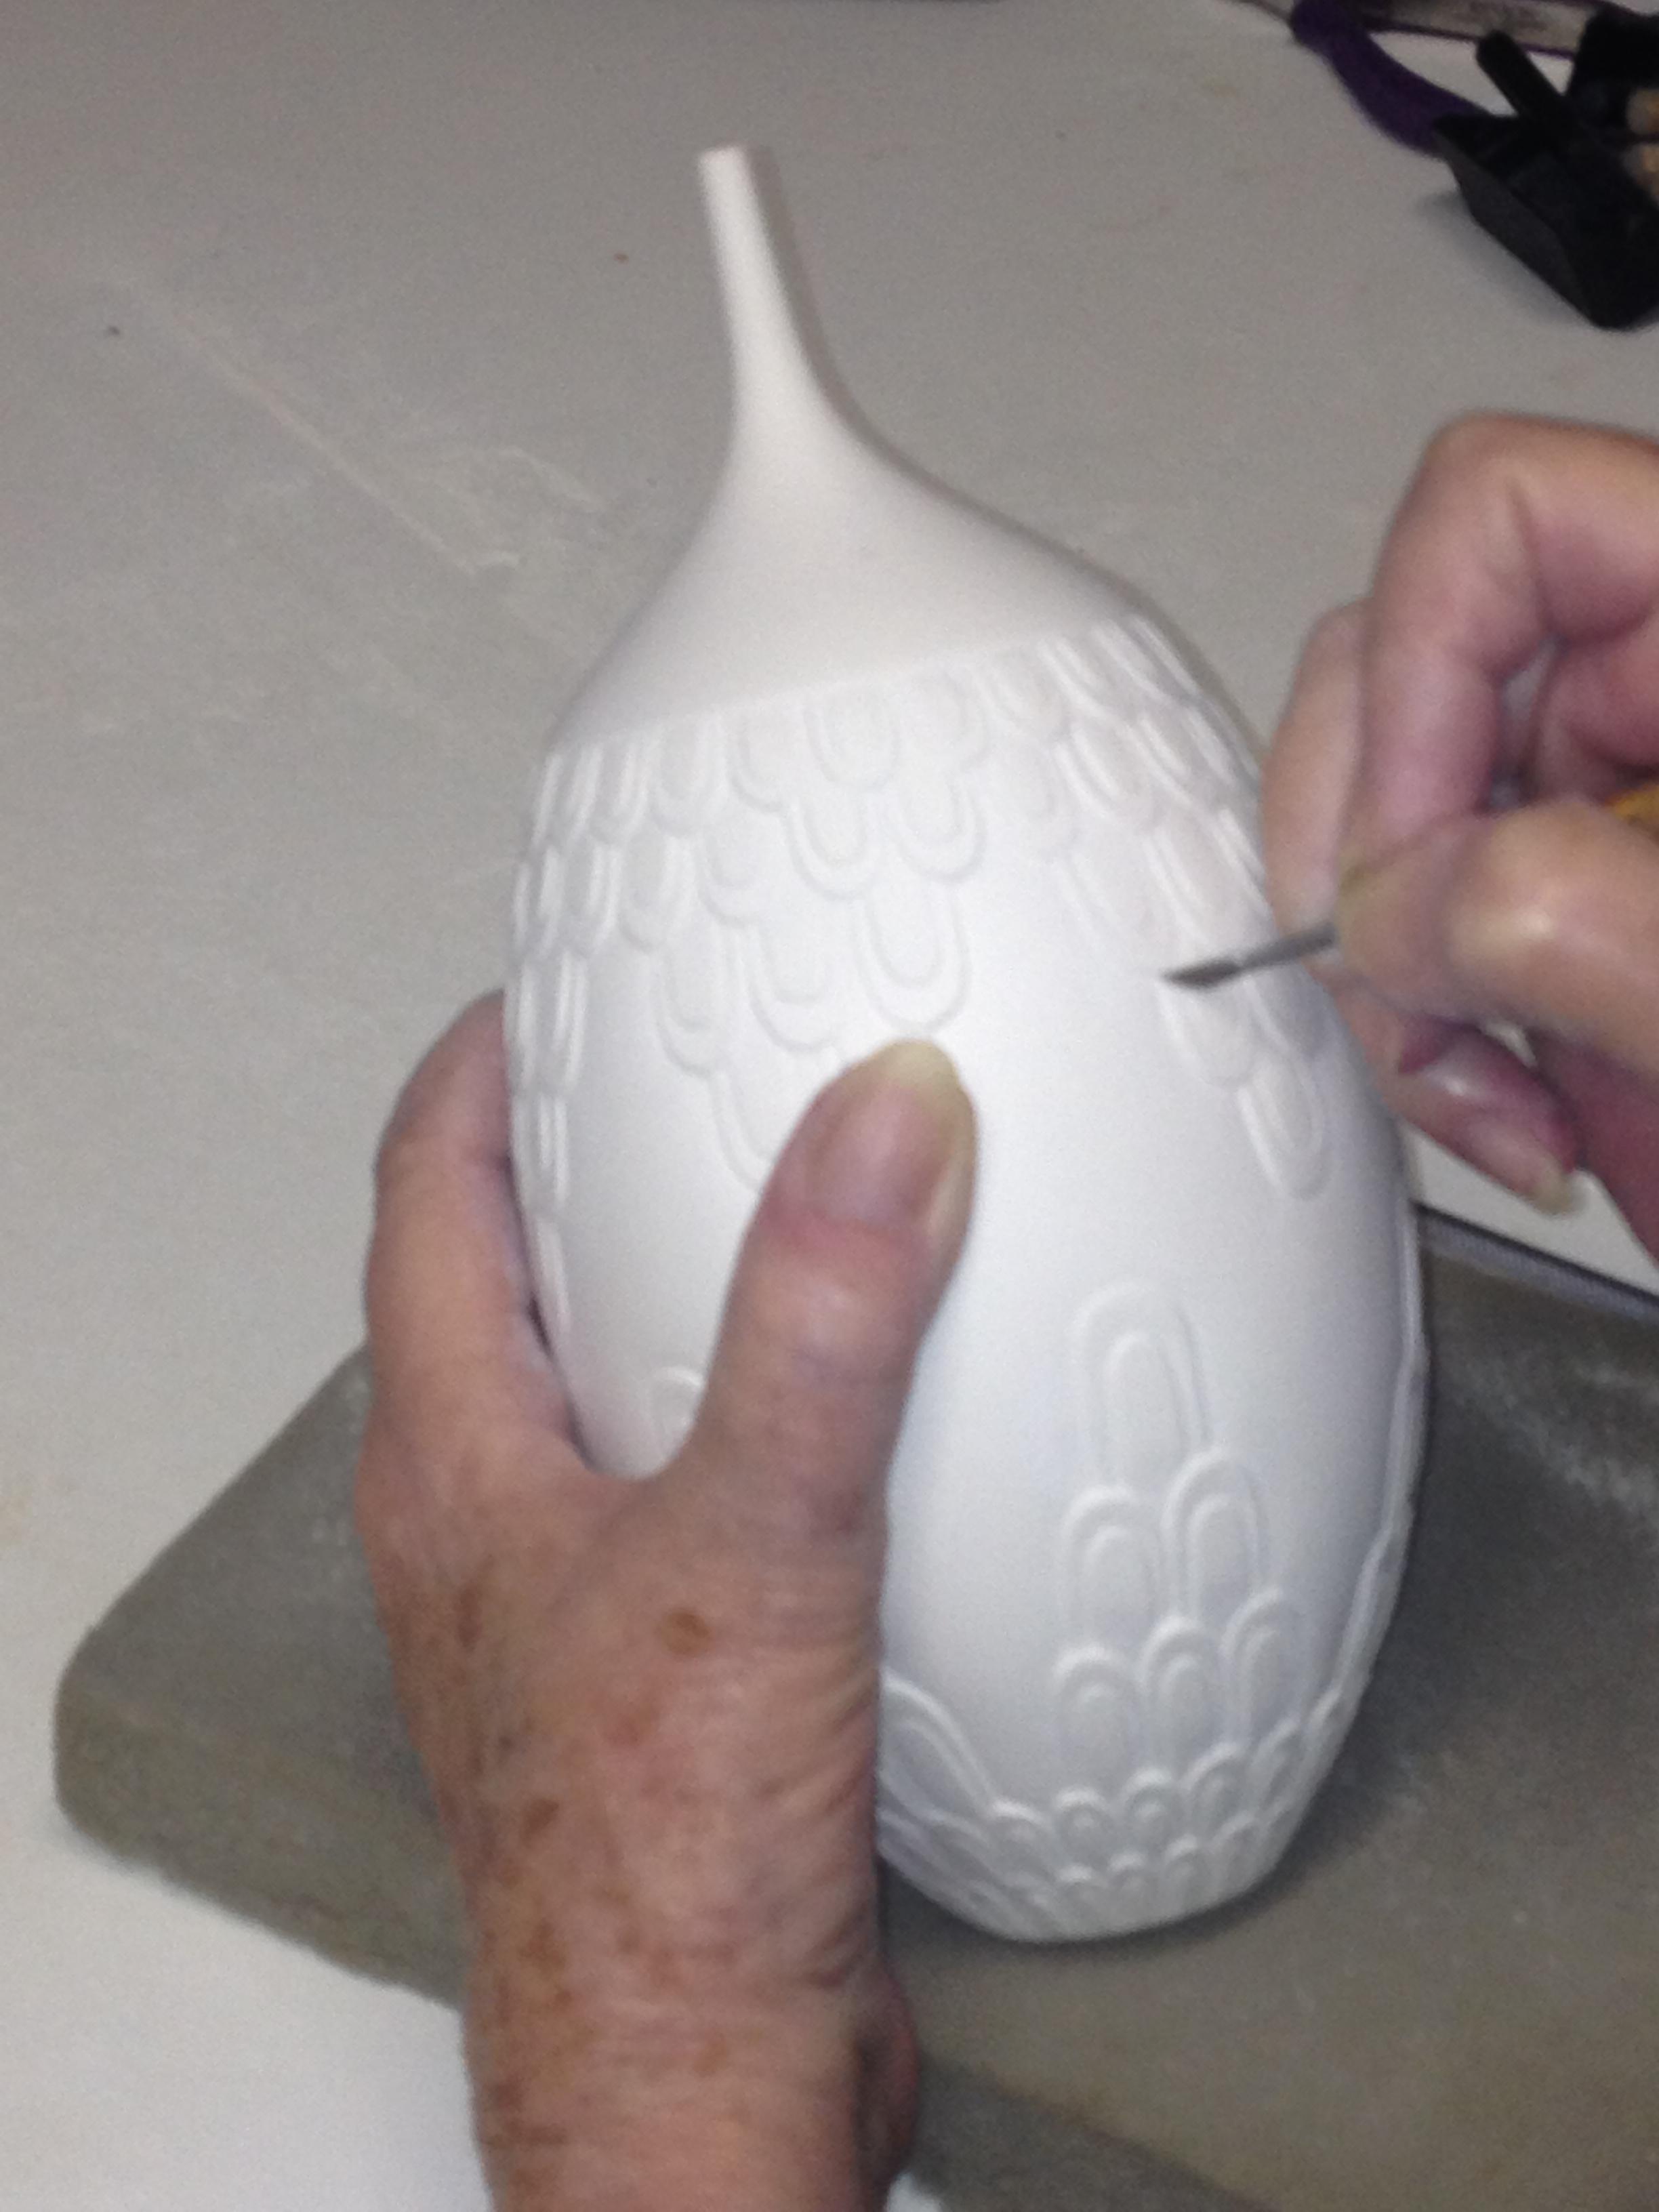 Carving on unfired, bone-dry porcelain.